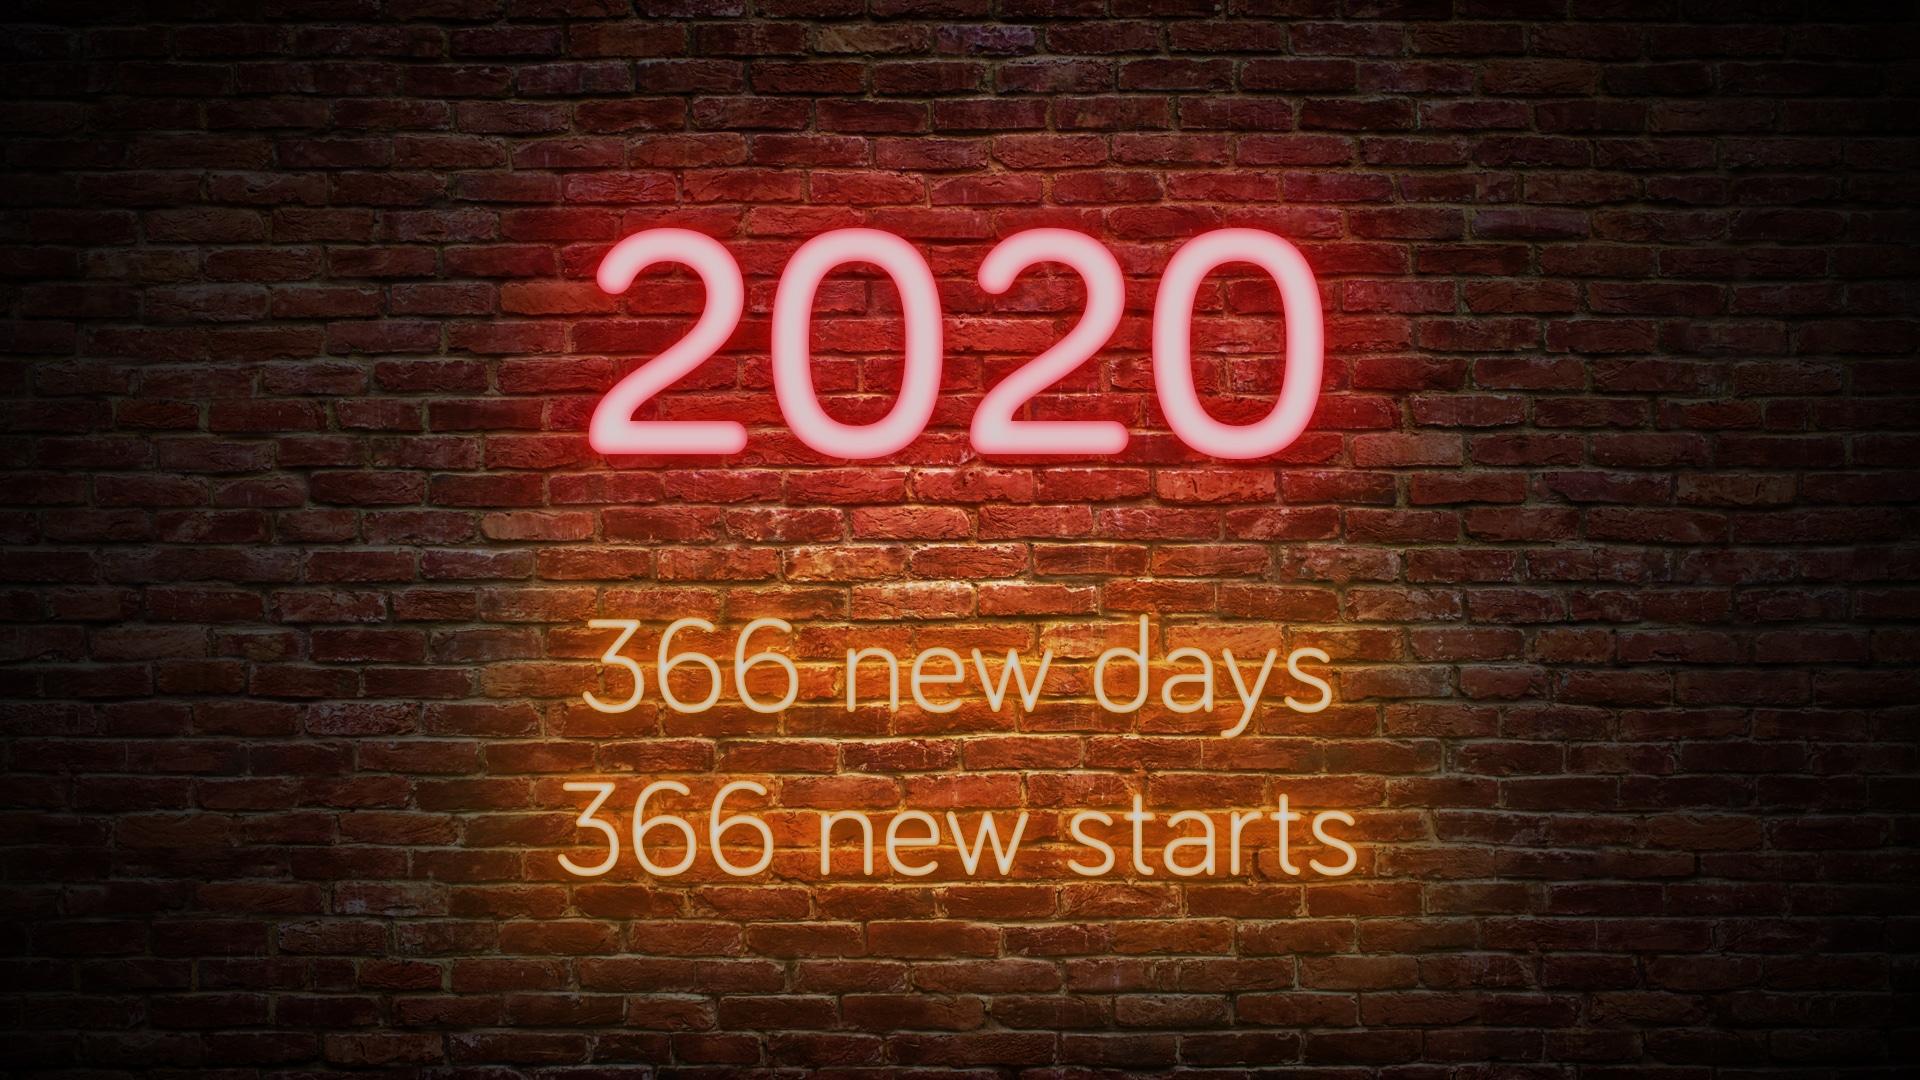 January 2020 Wallpaper For Desktop And Mobile